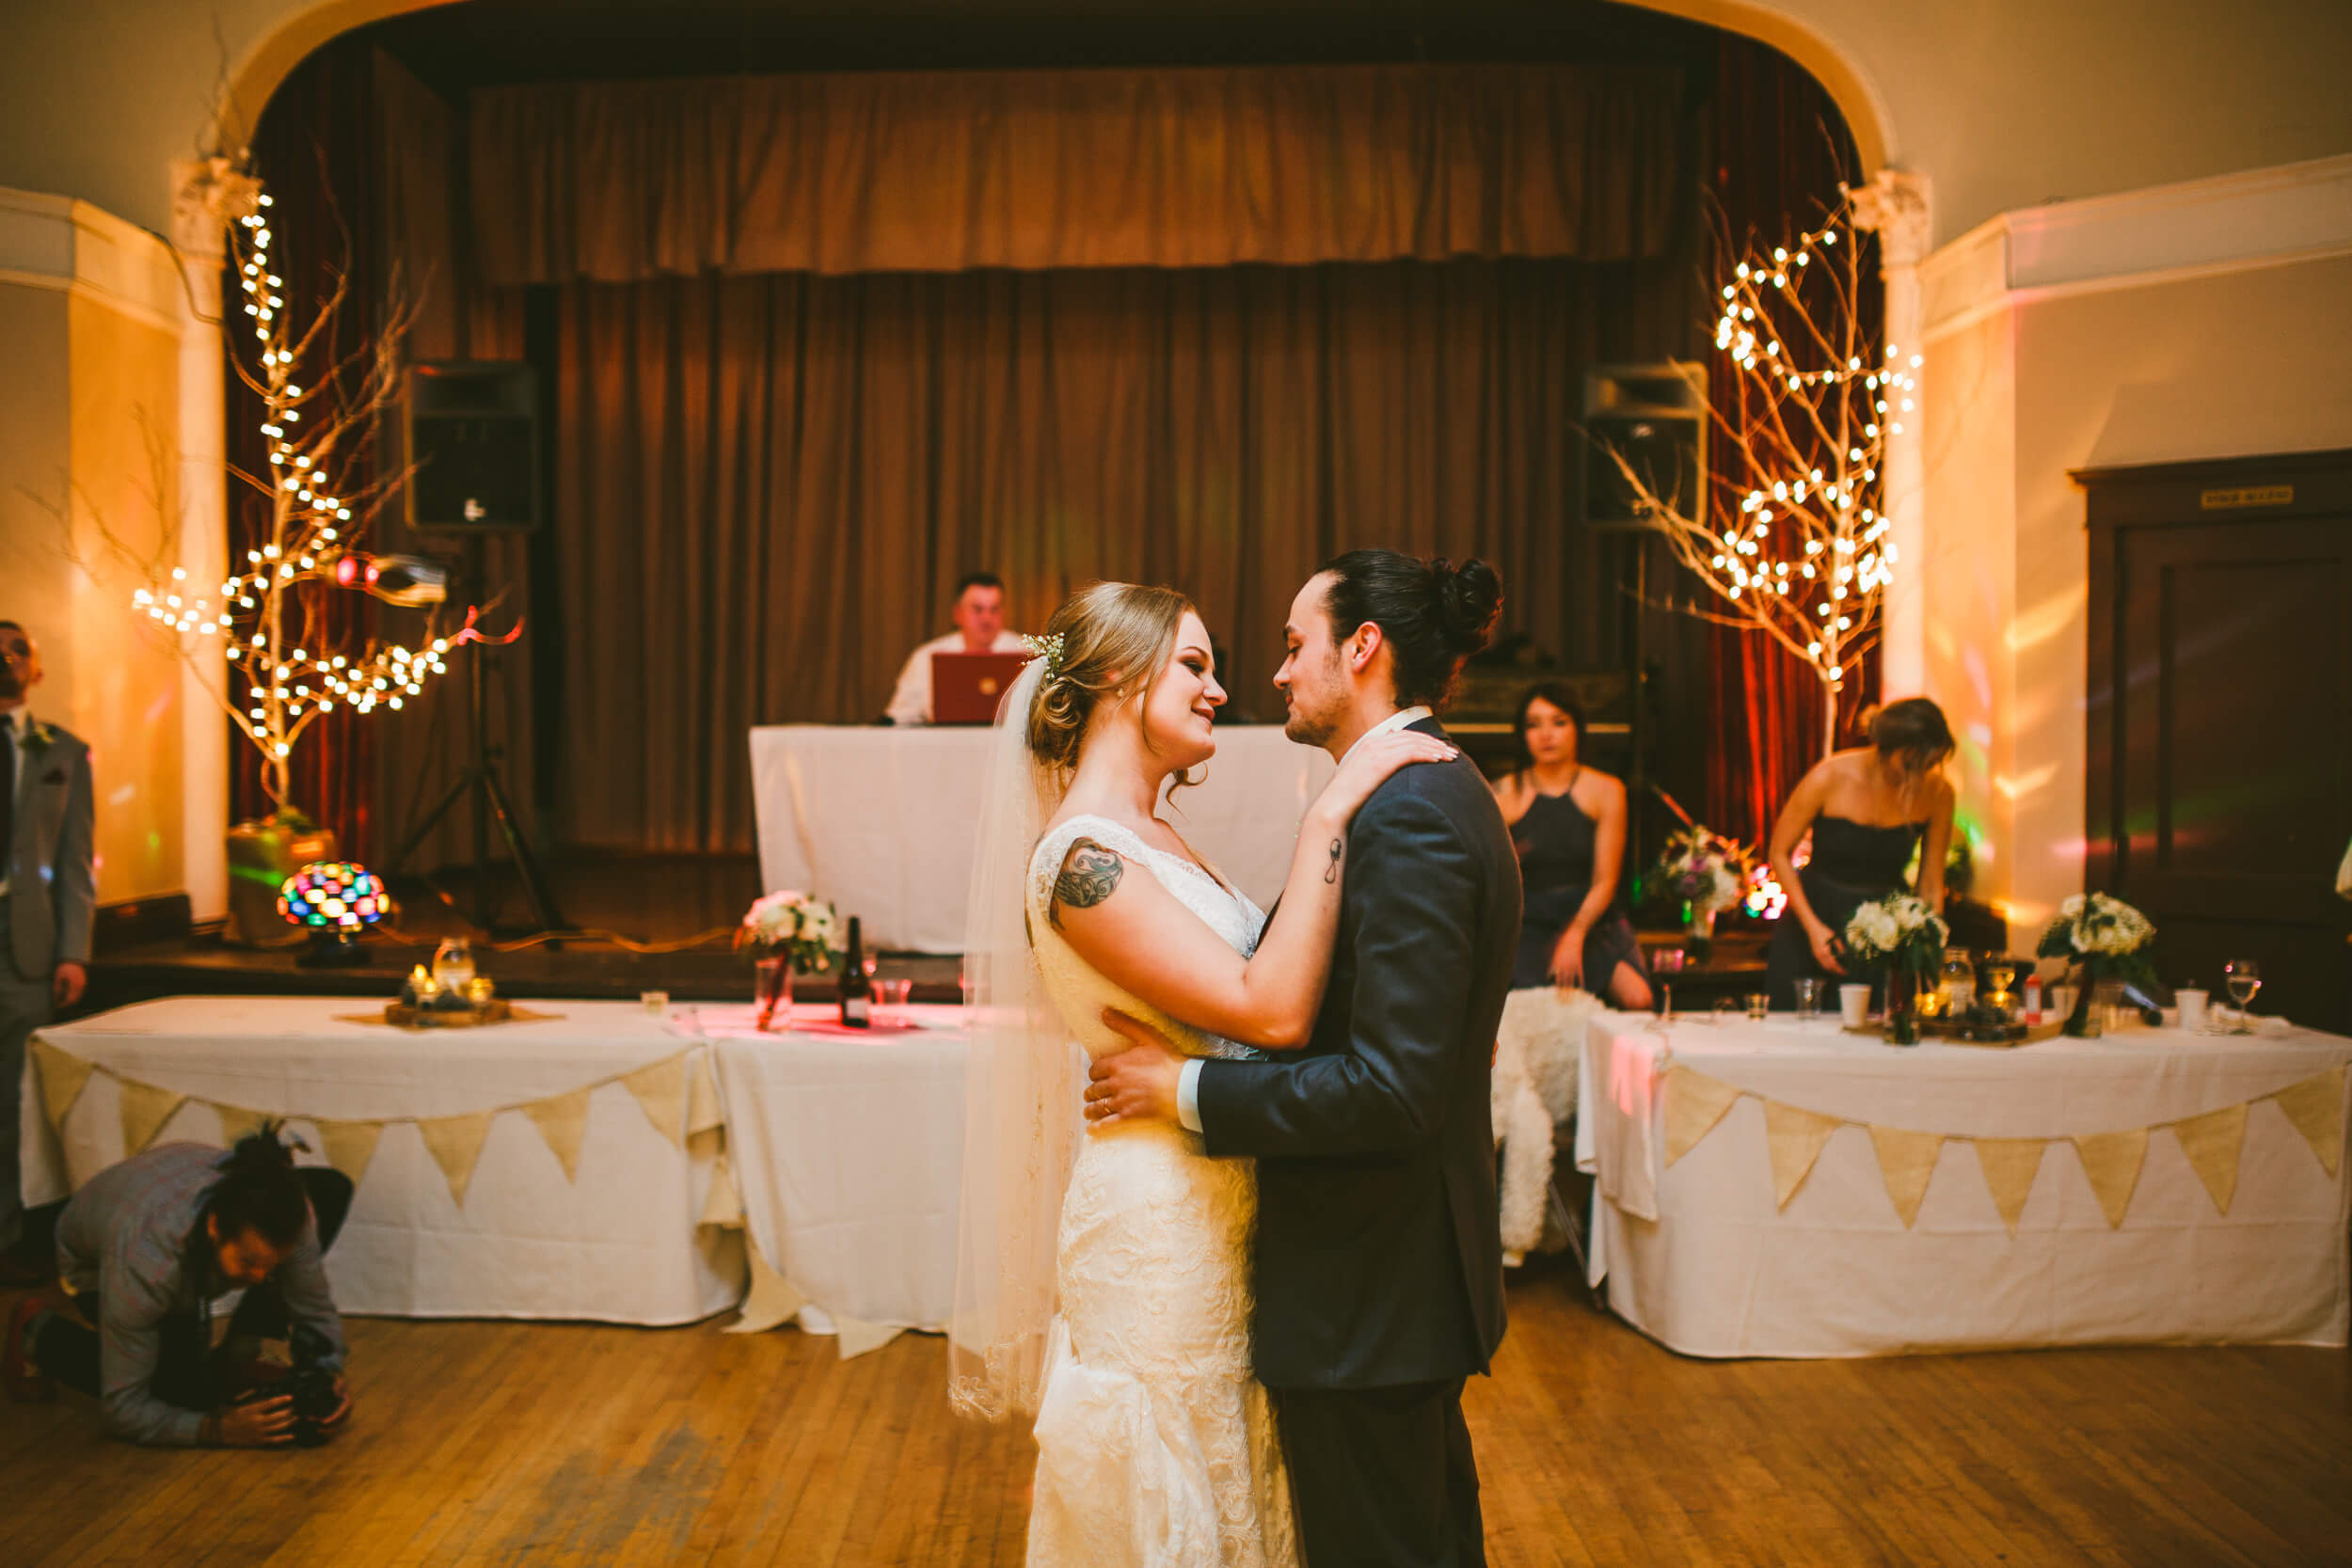 mukogawa winter wedding in spokane (274).jpg